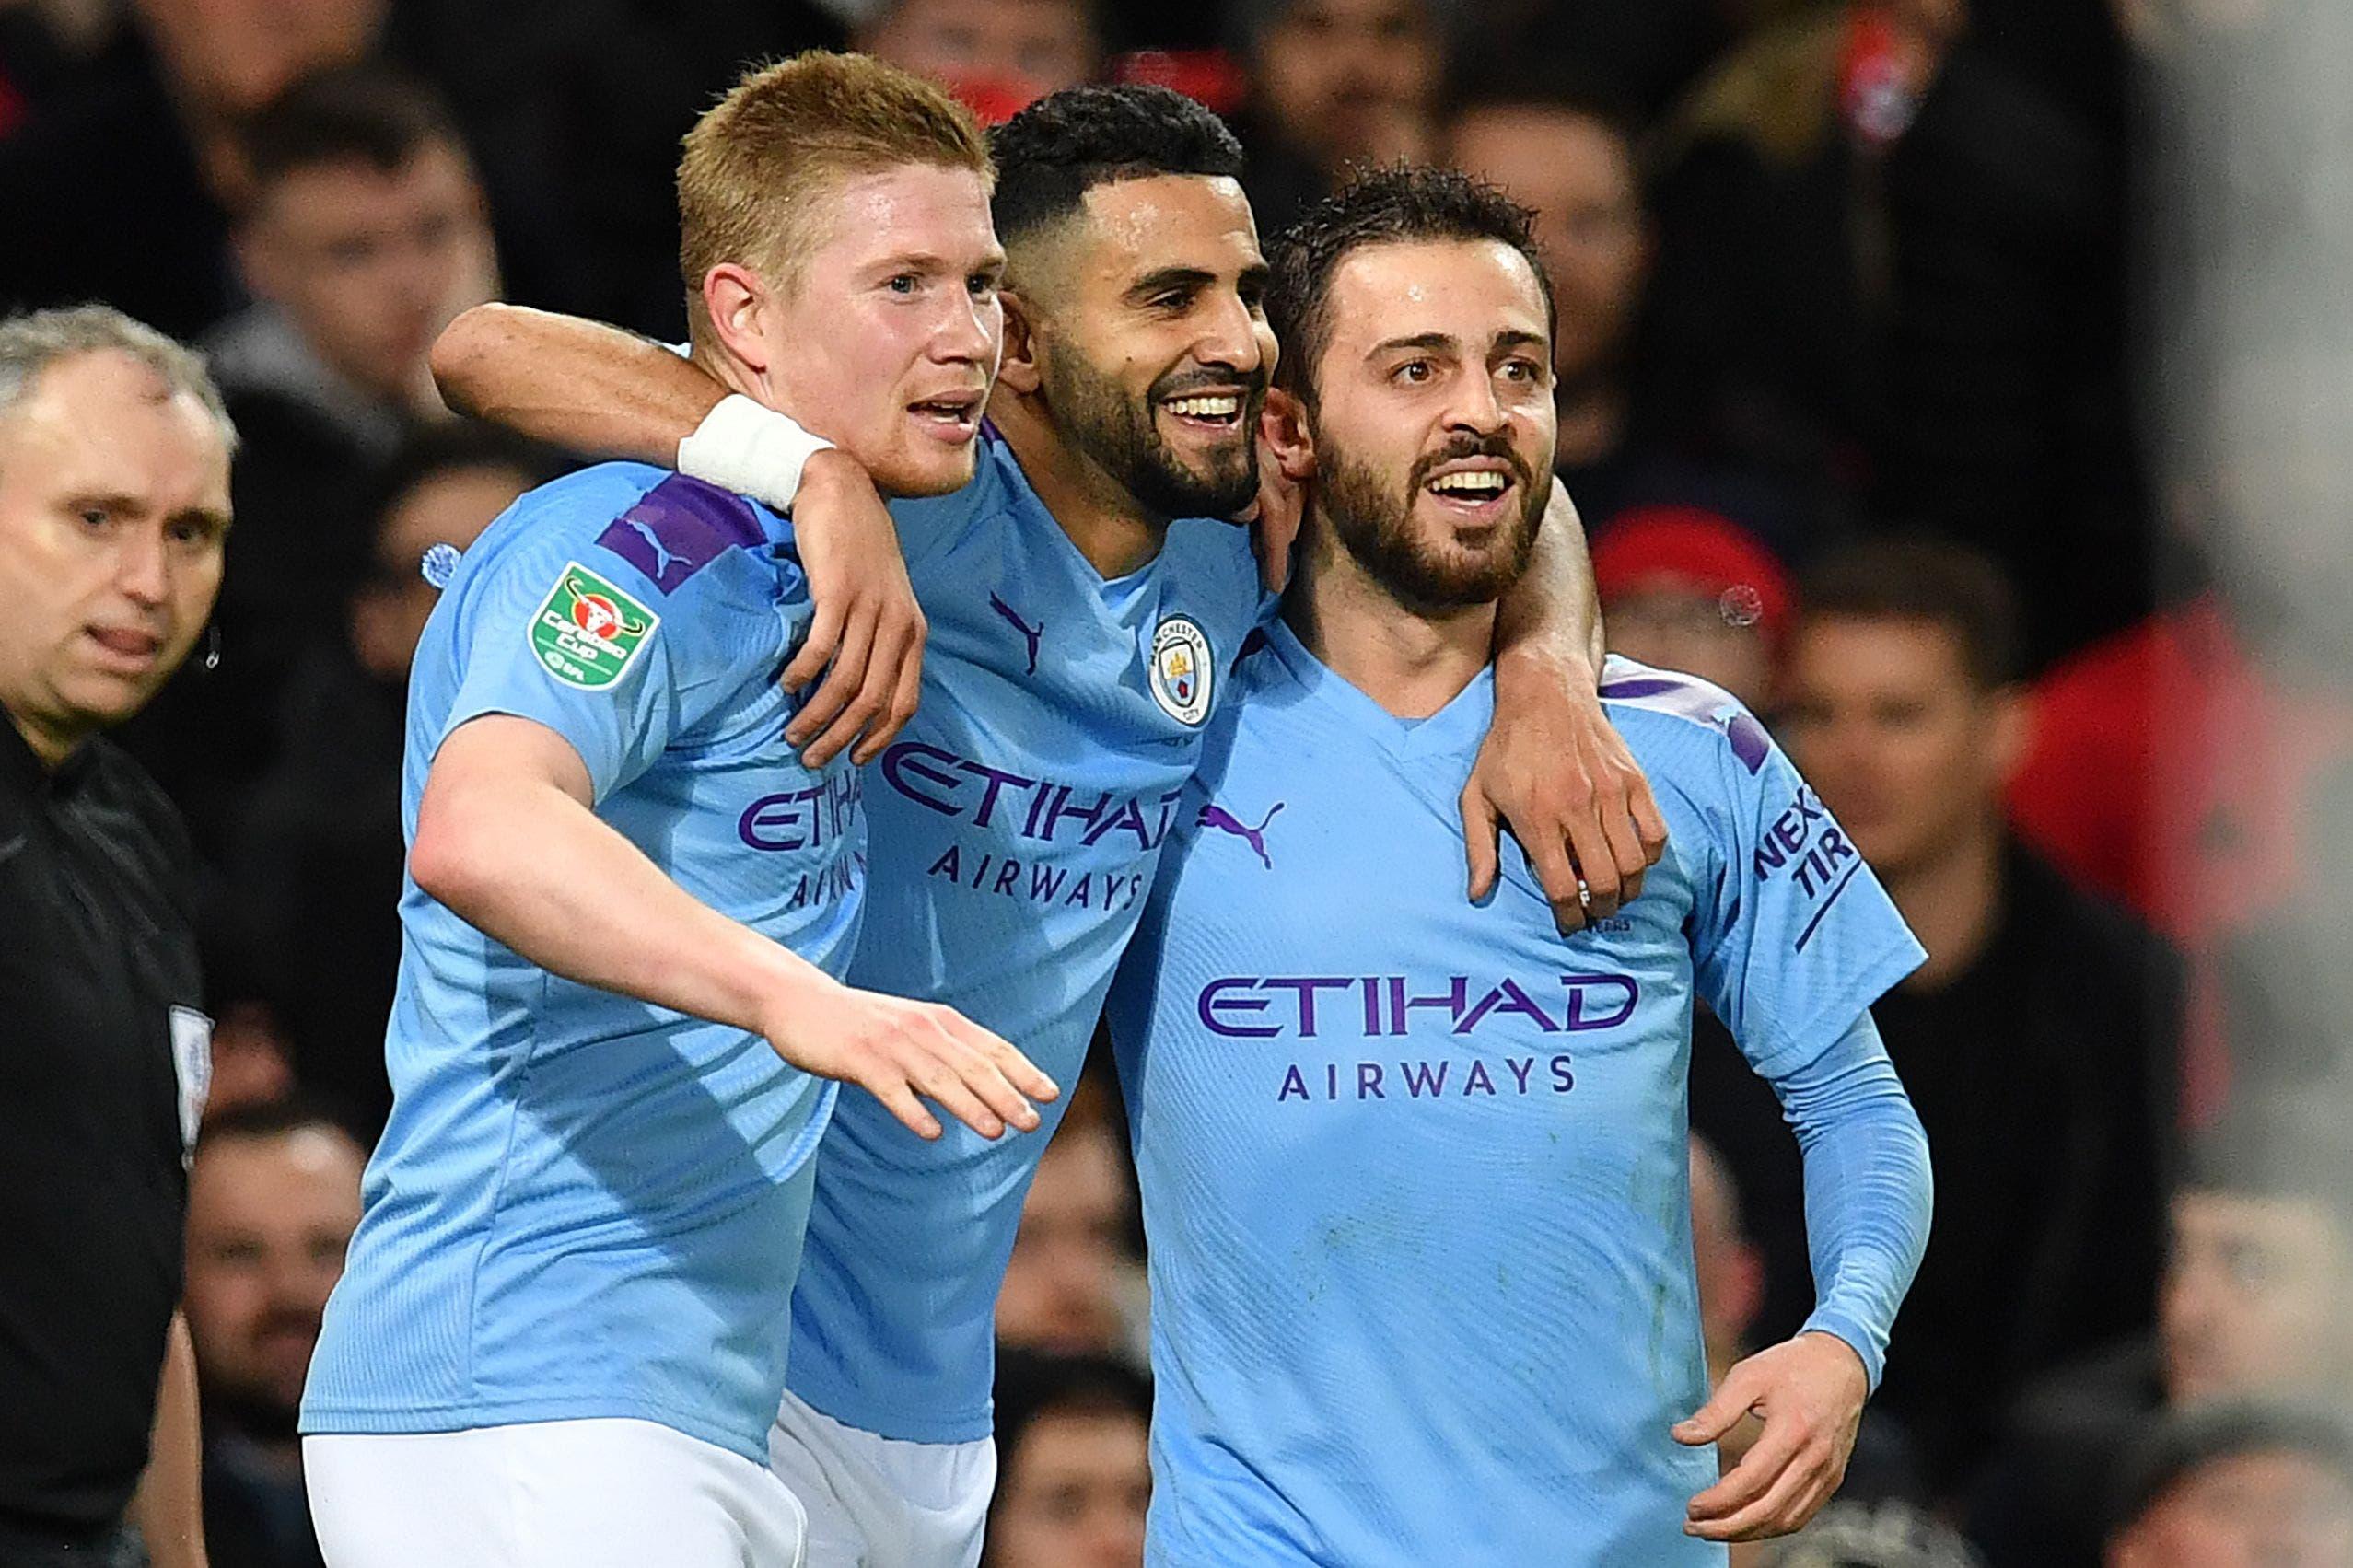 Manchester United-Manchester City: los Citizens ganaron 3-1 la ida de la semifinal de la Copa de la Liga